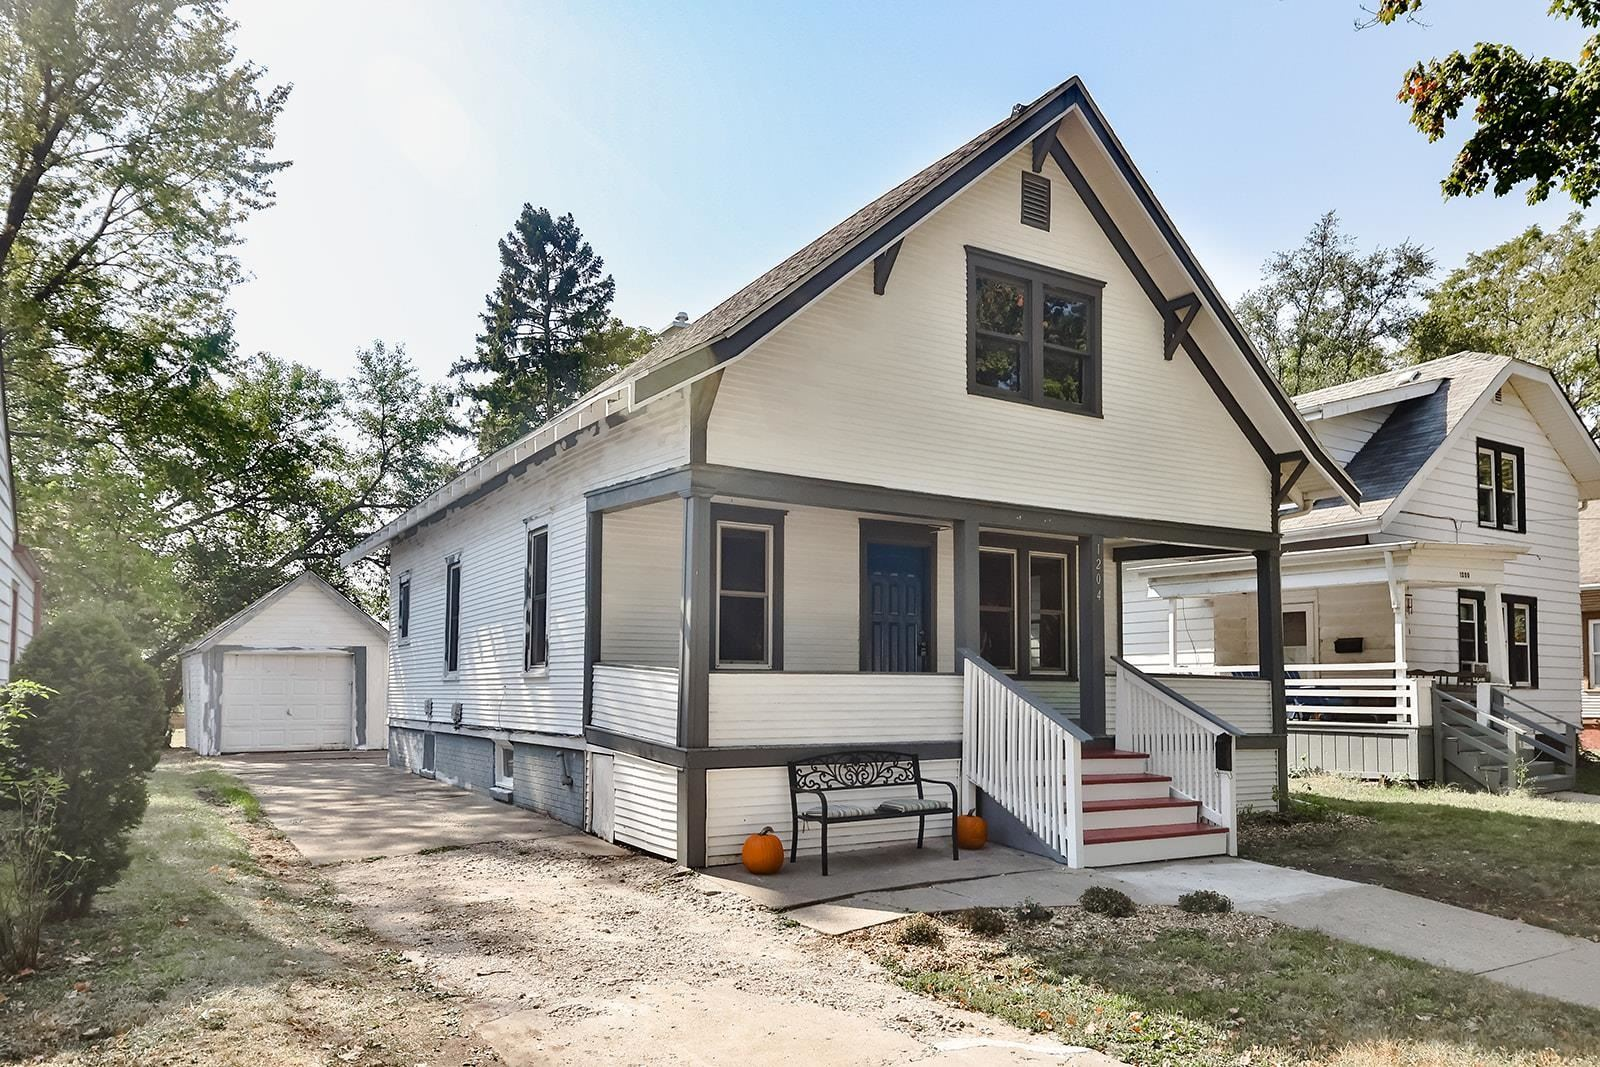 1204 Copeland Ave, Beloit, WI 53511 - #: 1921170